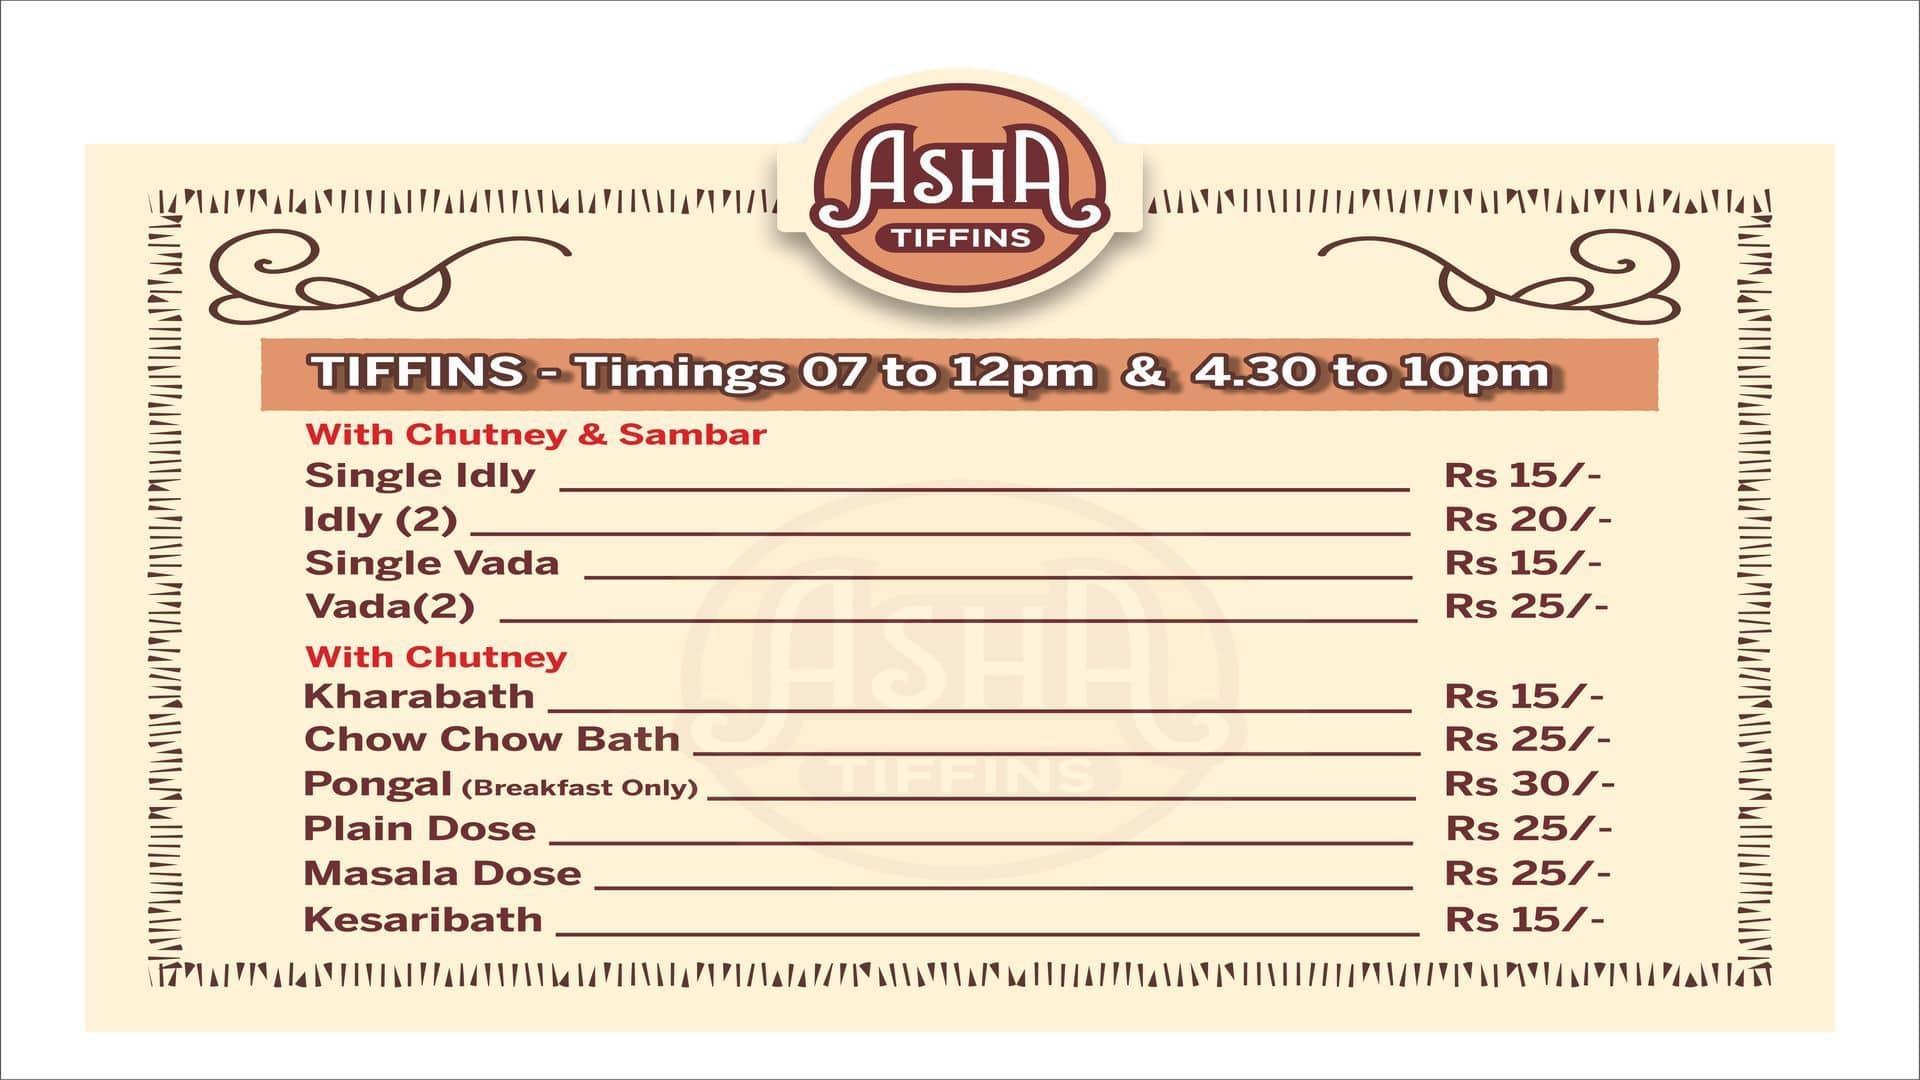 Asha tiffins menu menu for asha tiffins hsr bangalore zomato